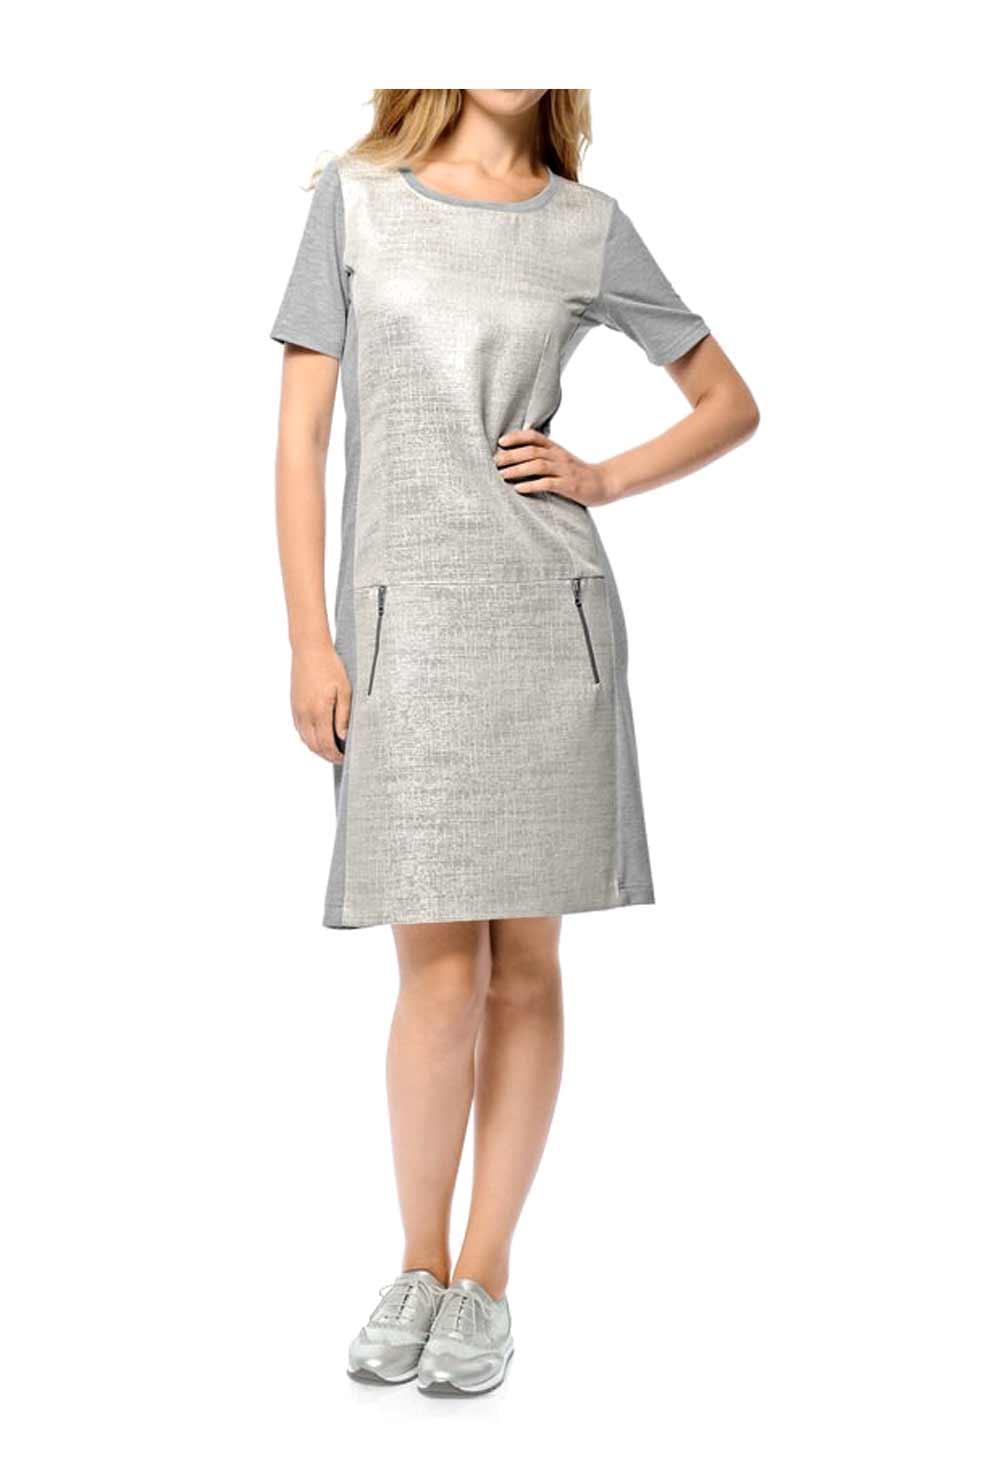 Kleid silber-grau | Kleider | Outlet Mode-Shop